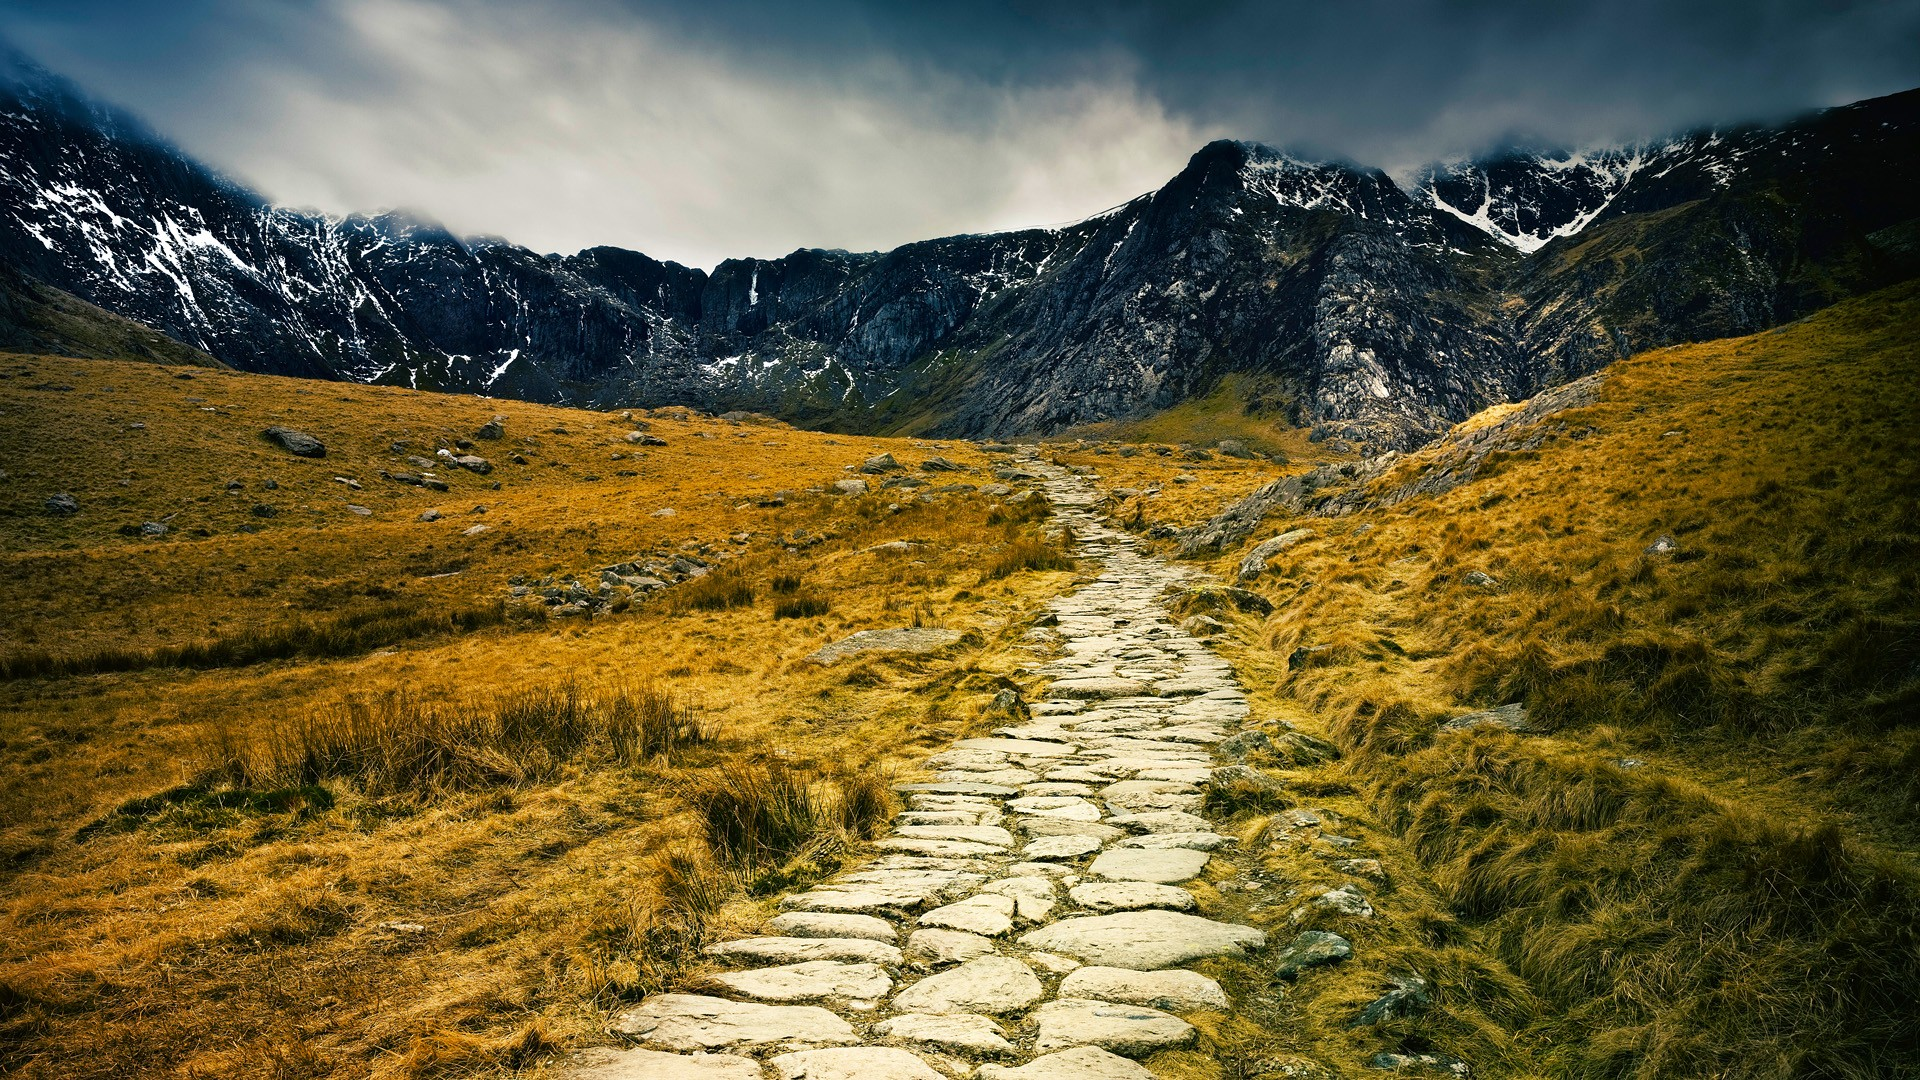 Path Wales Wallpaper 1920x1080 Path Wales National Park 1920x1080